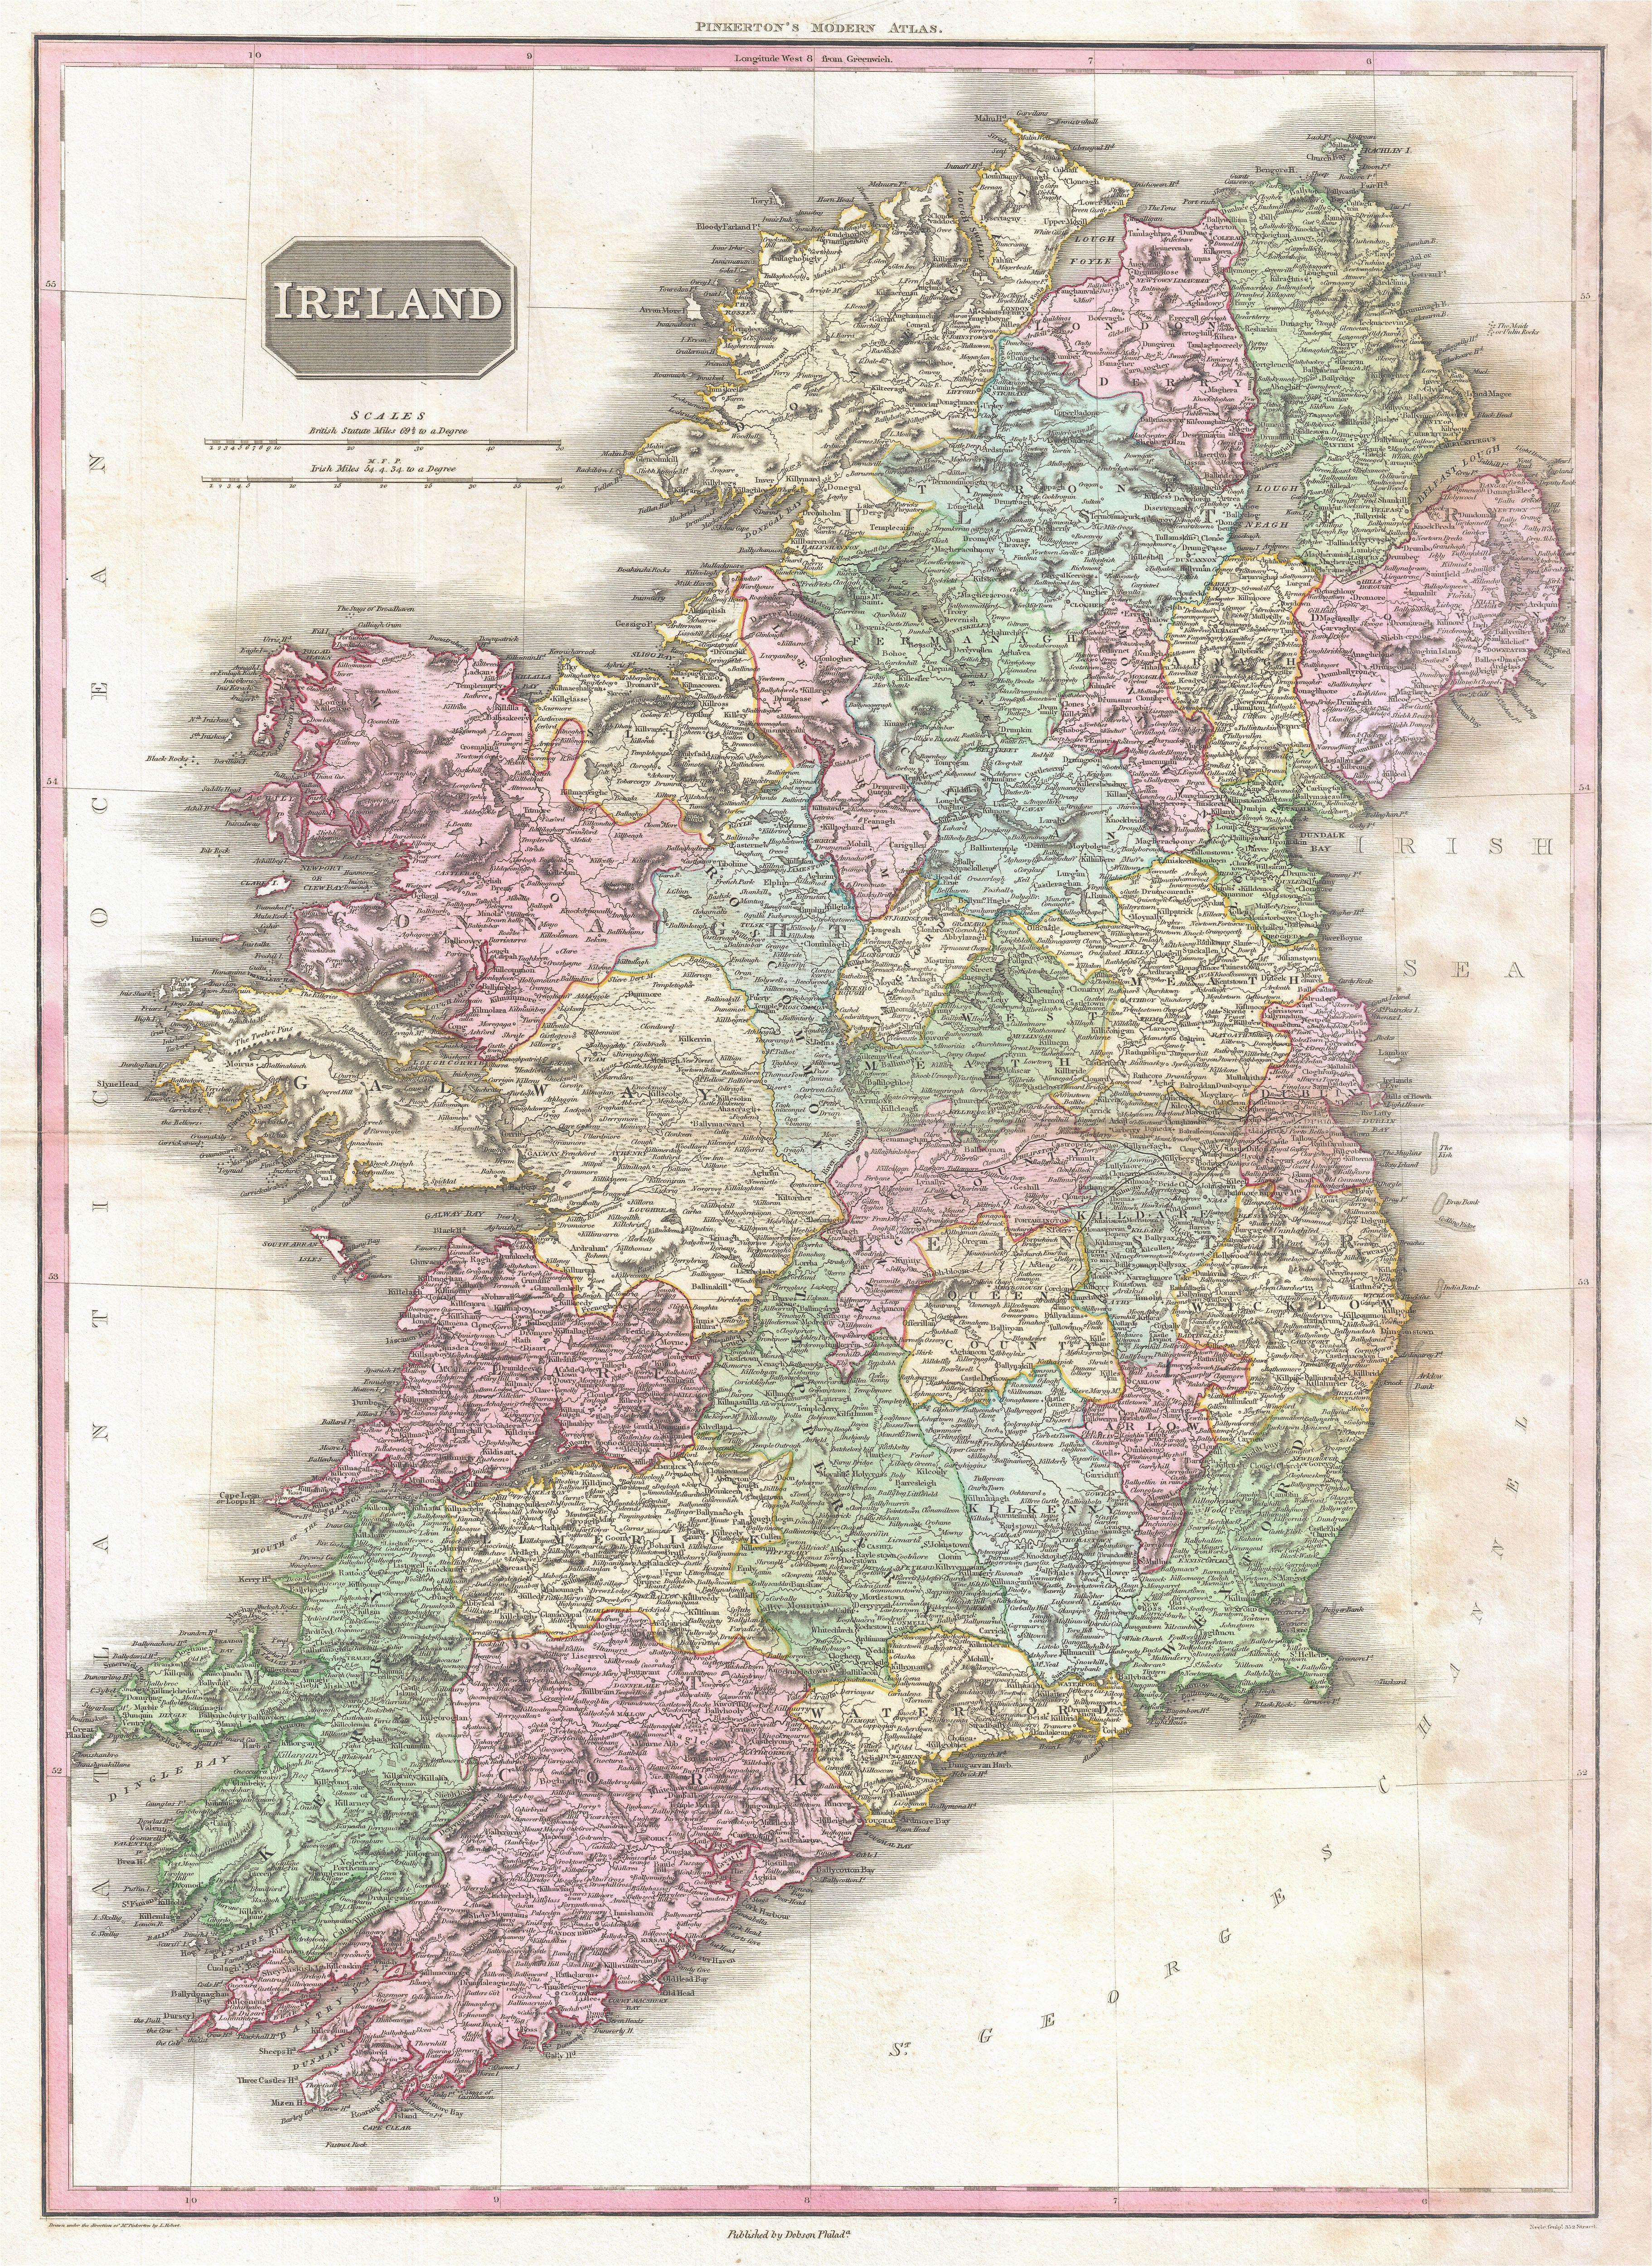 Ireland History In Maps File 1818 Pinkerton Map Of Ireland Geographicus Ireland